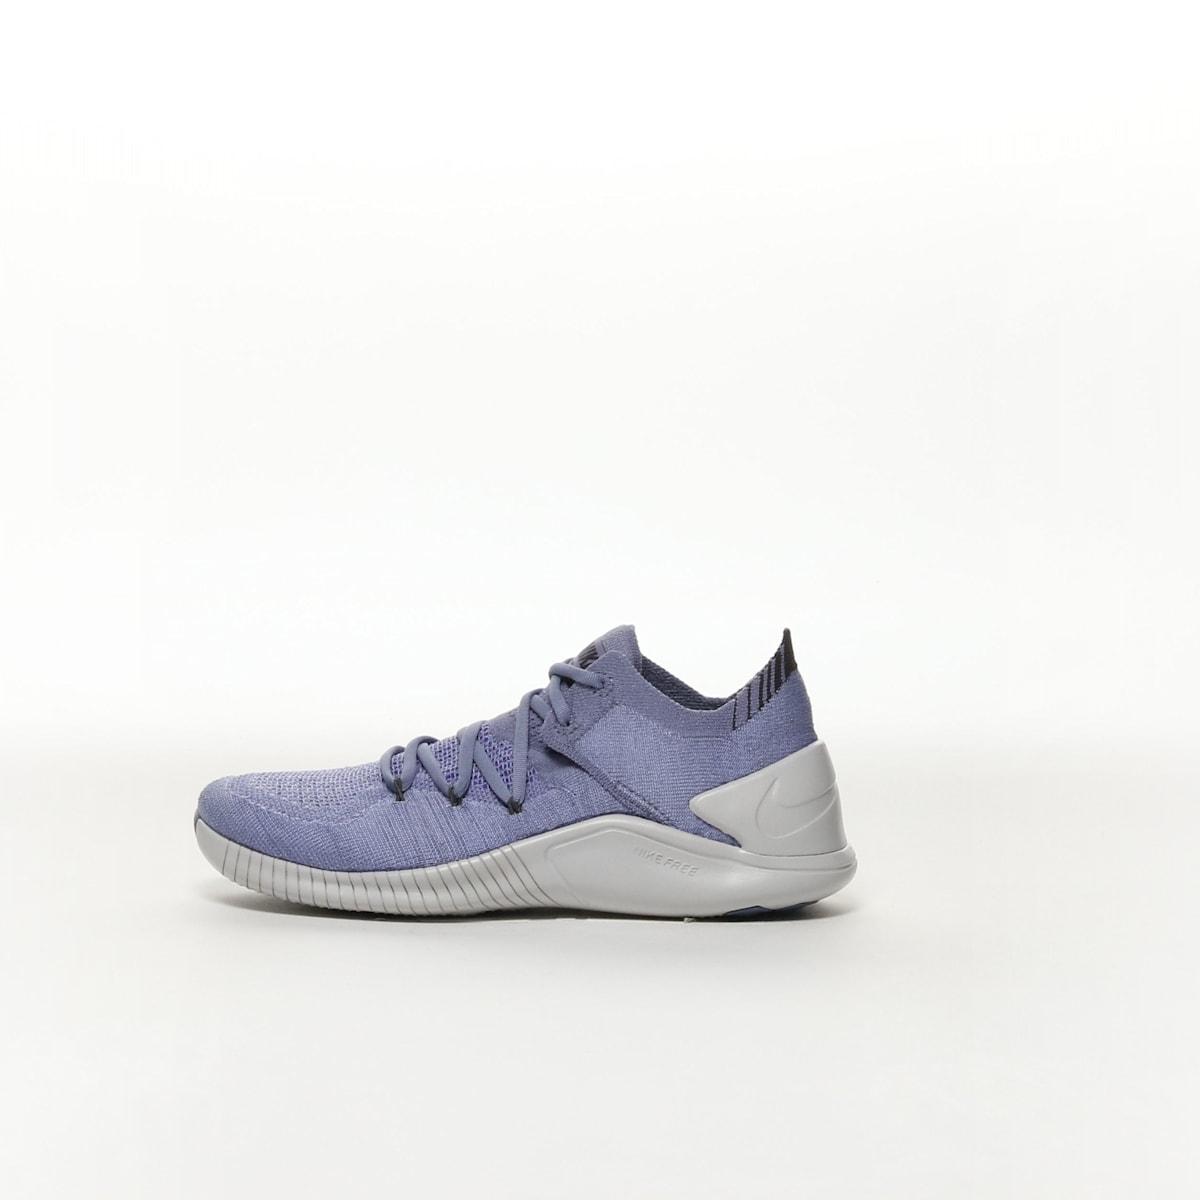 e52f8d1481412 Nike Free TR Flyknit 3 - IRON PURPLE ANTHRACITE VAST GREY – Resku